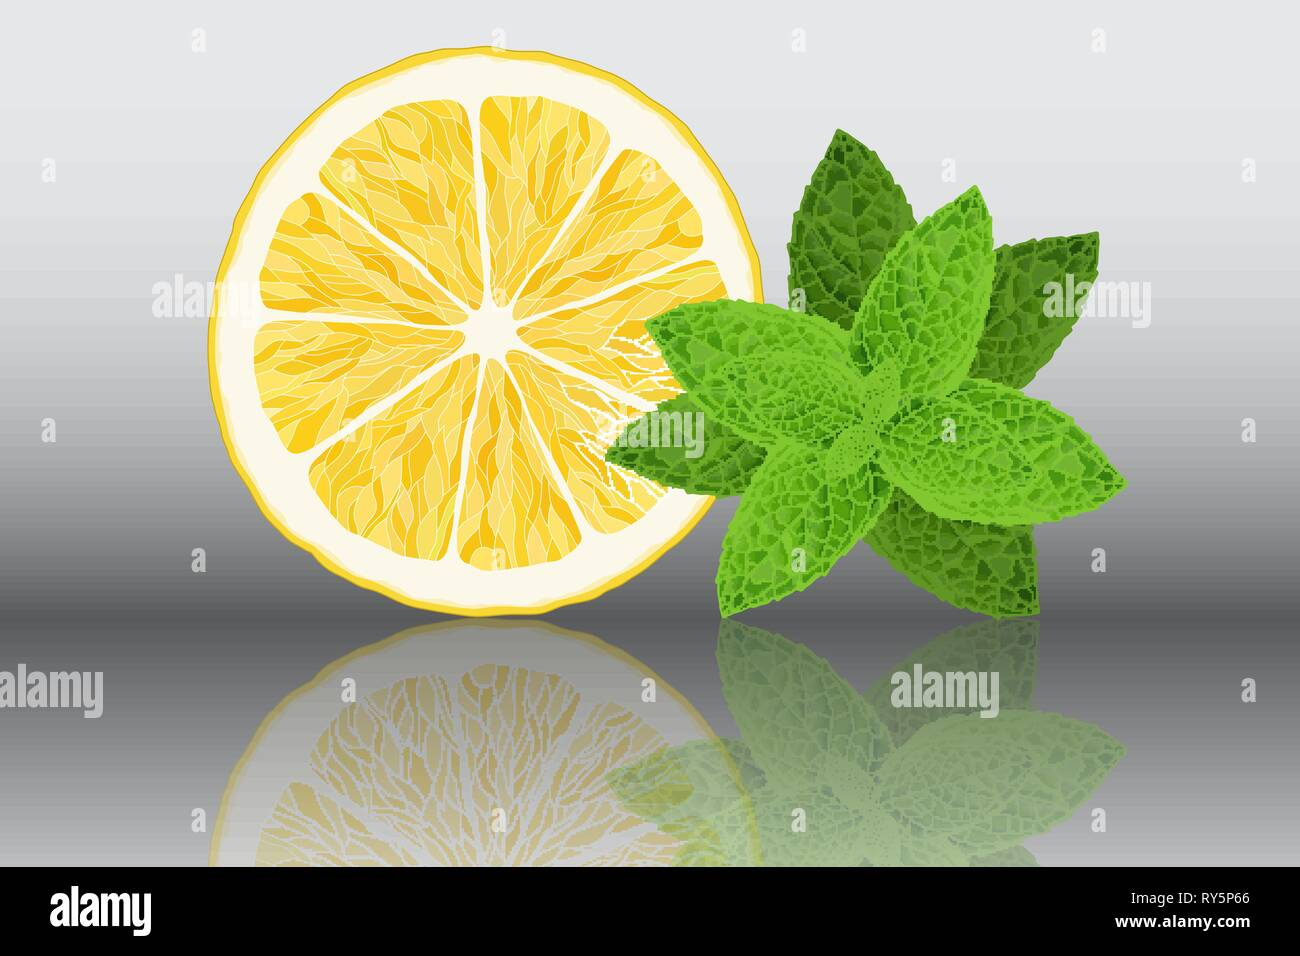 Lemon and mint reslistic vector illustration on grey background - Stock Vector